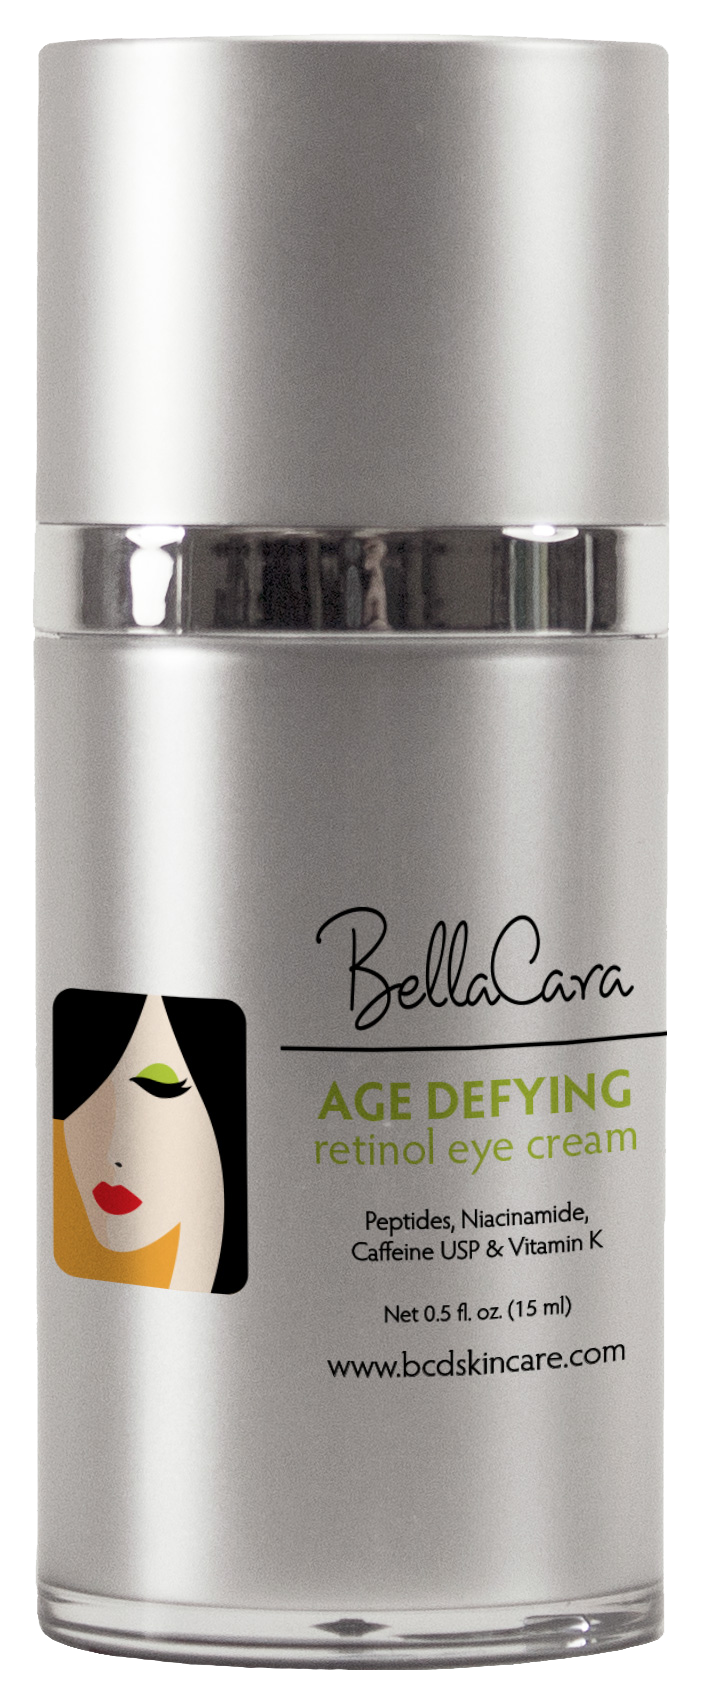 Age Defying Retinol Eye Cream.png